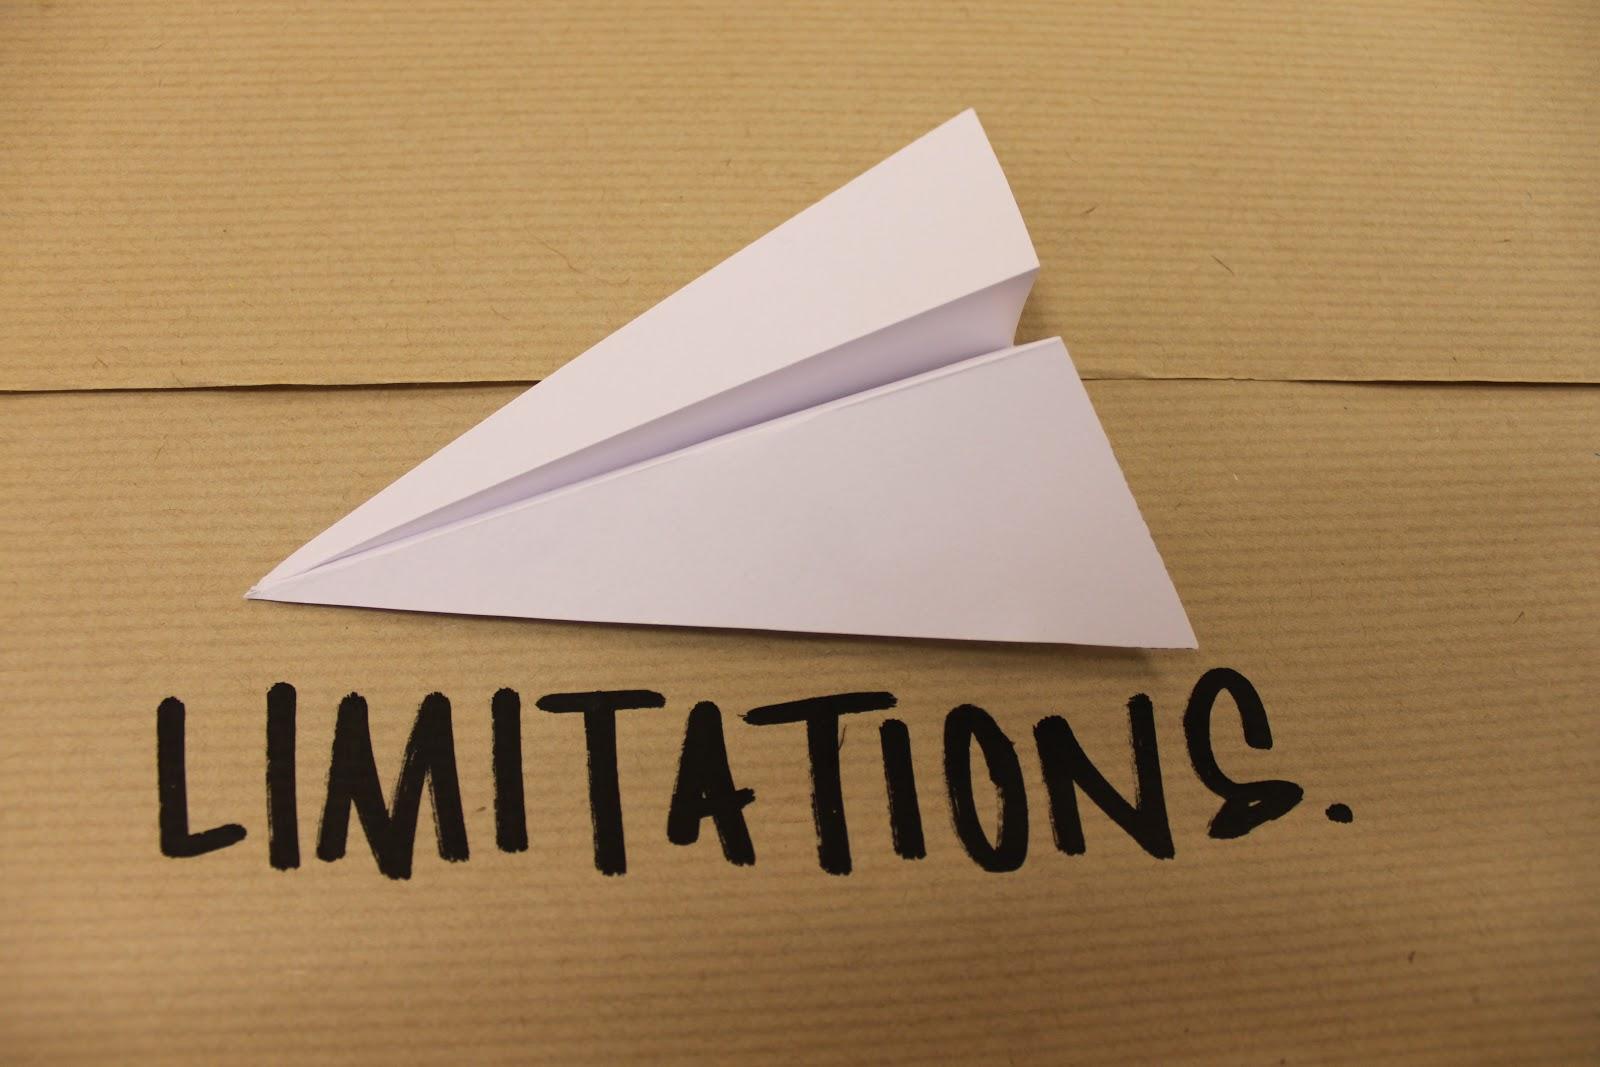 Unknown clipart limitation Microeconomics Zone Cliparts Cliparts Limitations